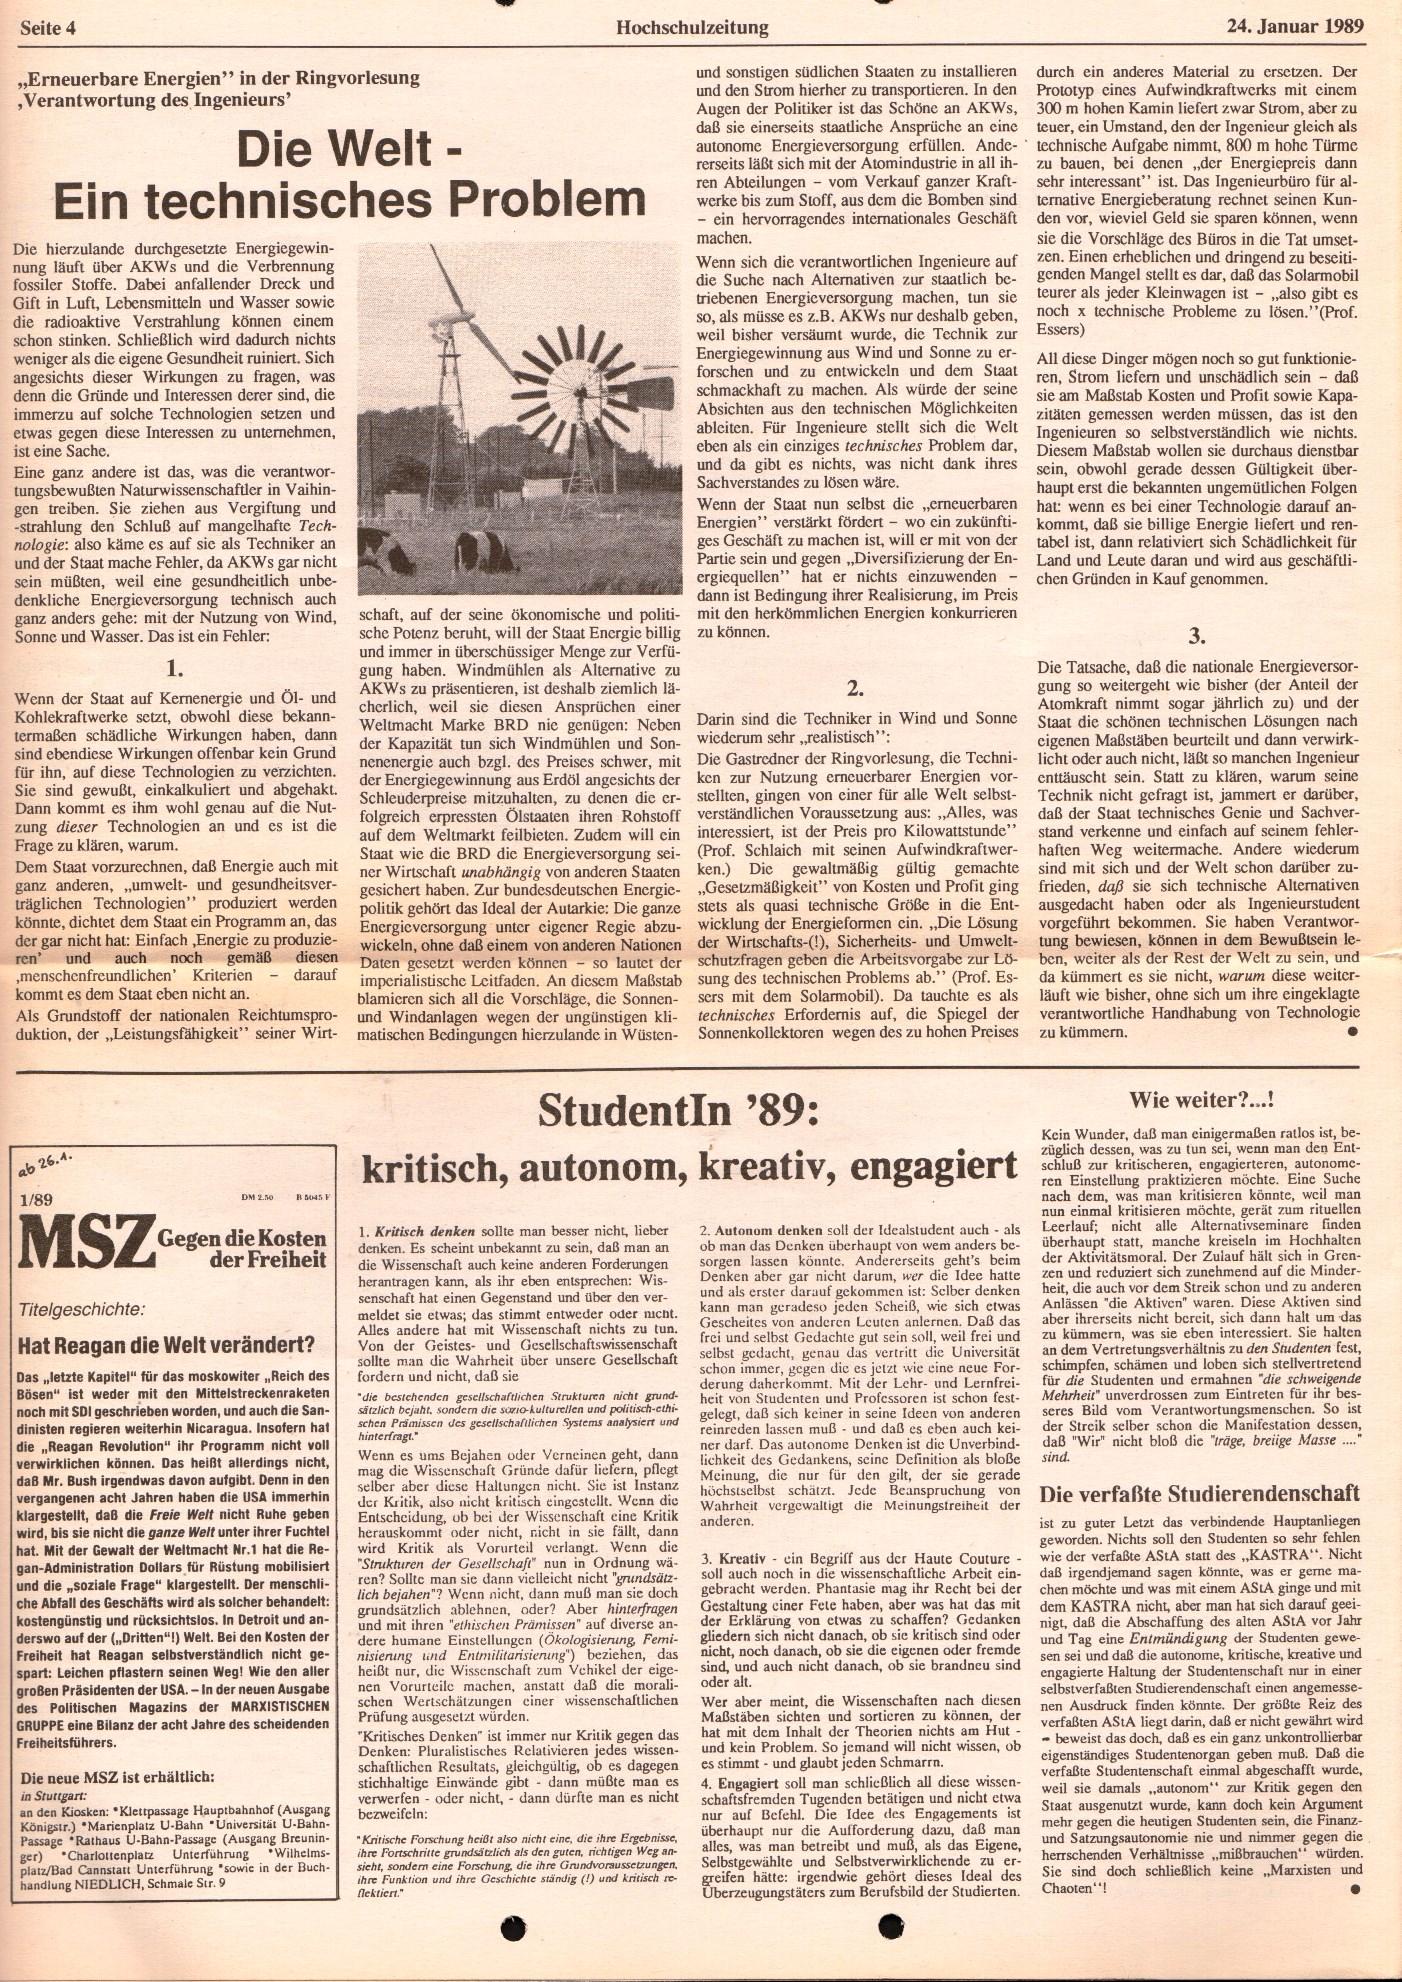 Stuttgart_MG_Hochschulzeitung_1989_02_04